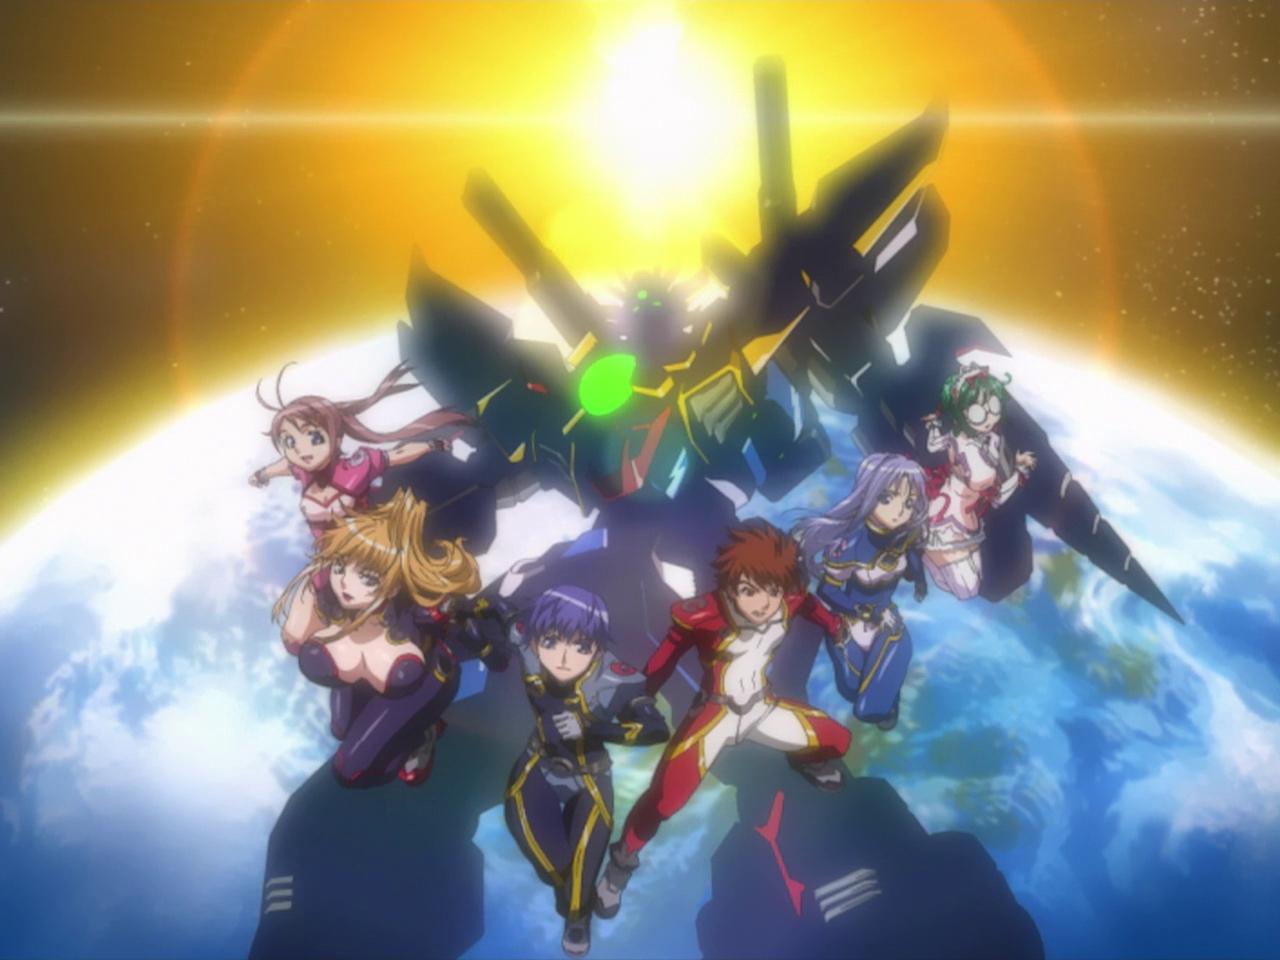 Gravion zwei anime - Evageeks forum ...